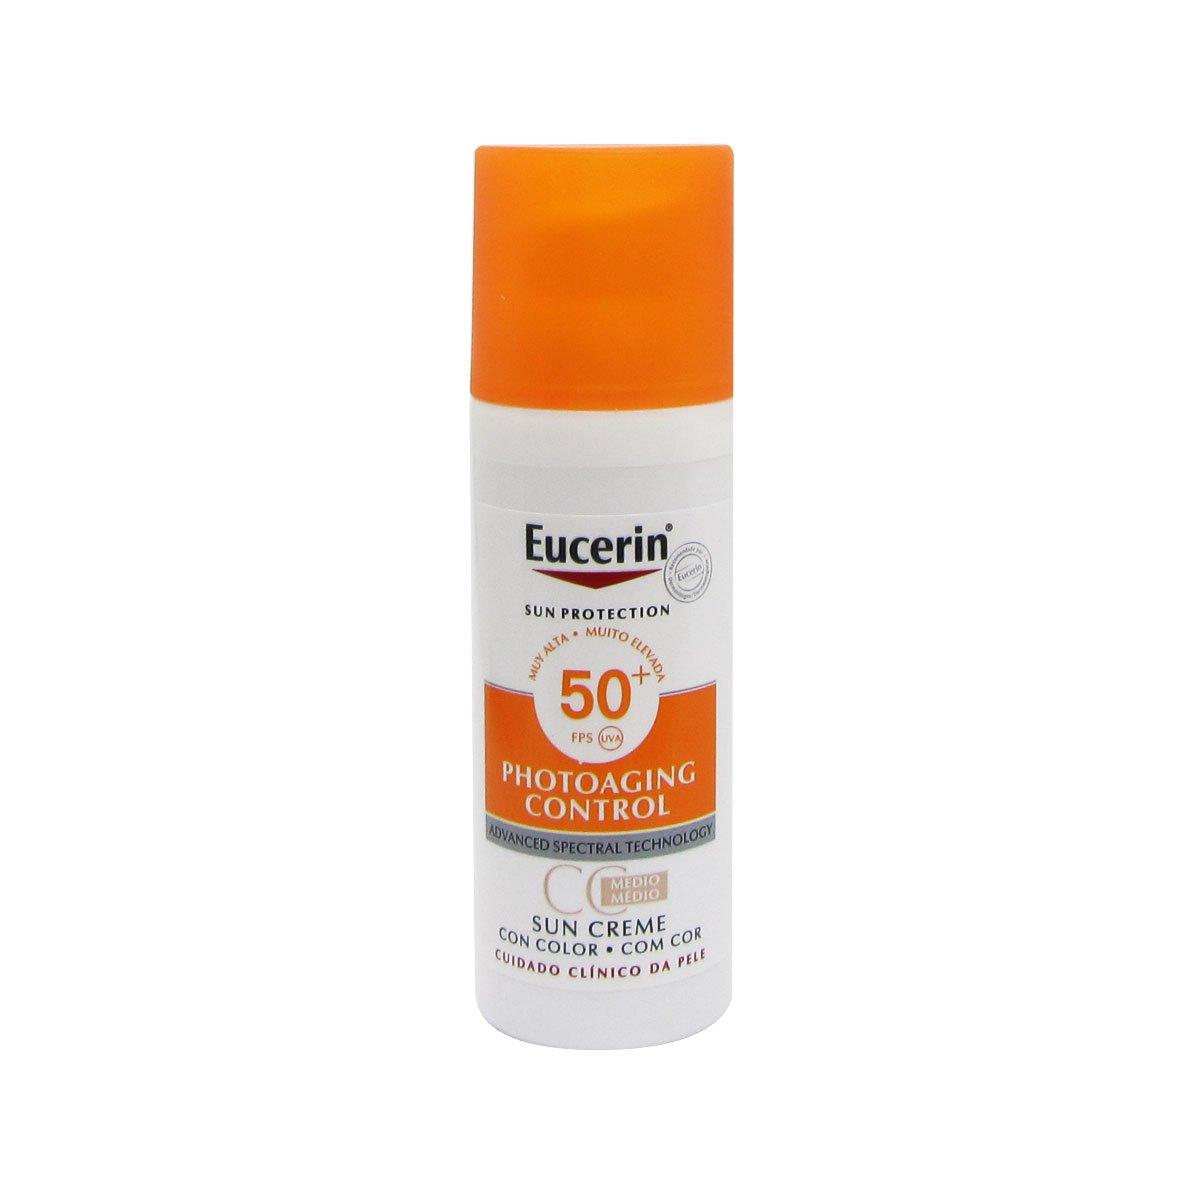 Eucerin Sun Face Tinted Cream Spf50 50ml